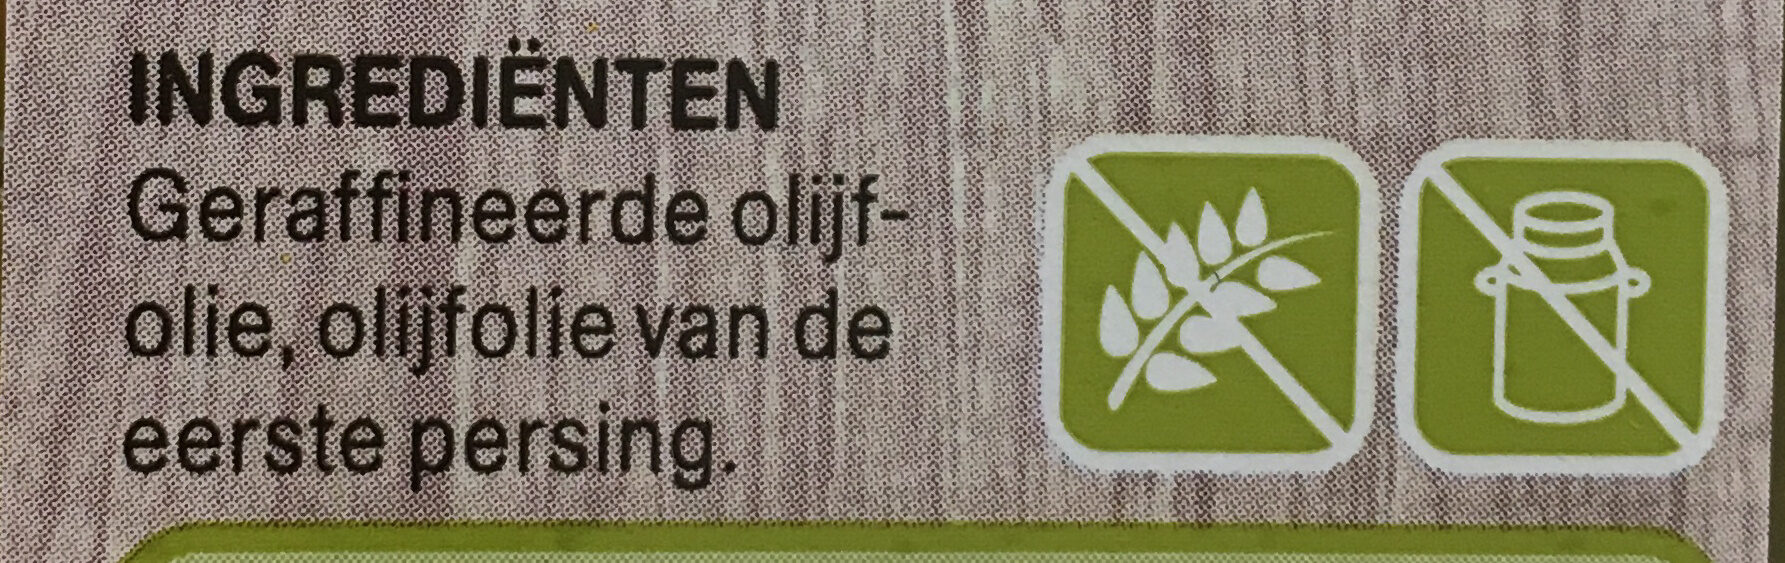 Traditionele Olijfolie - Ingredients